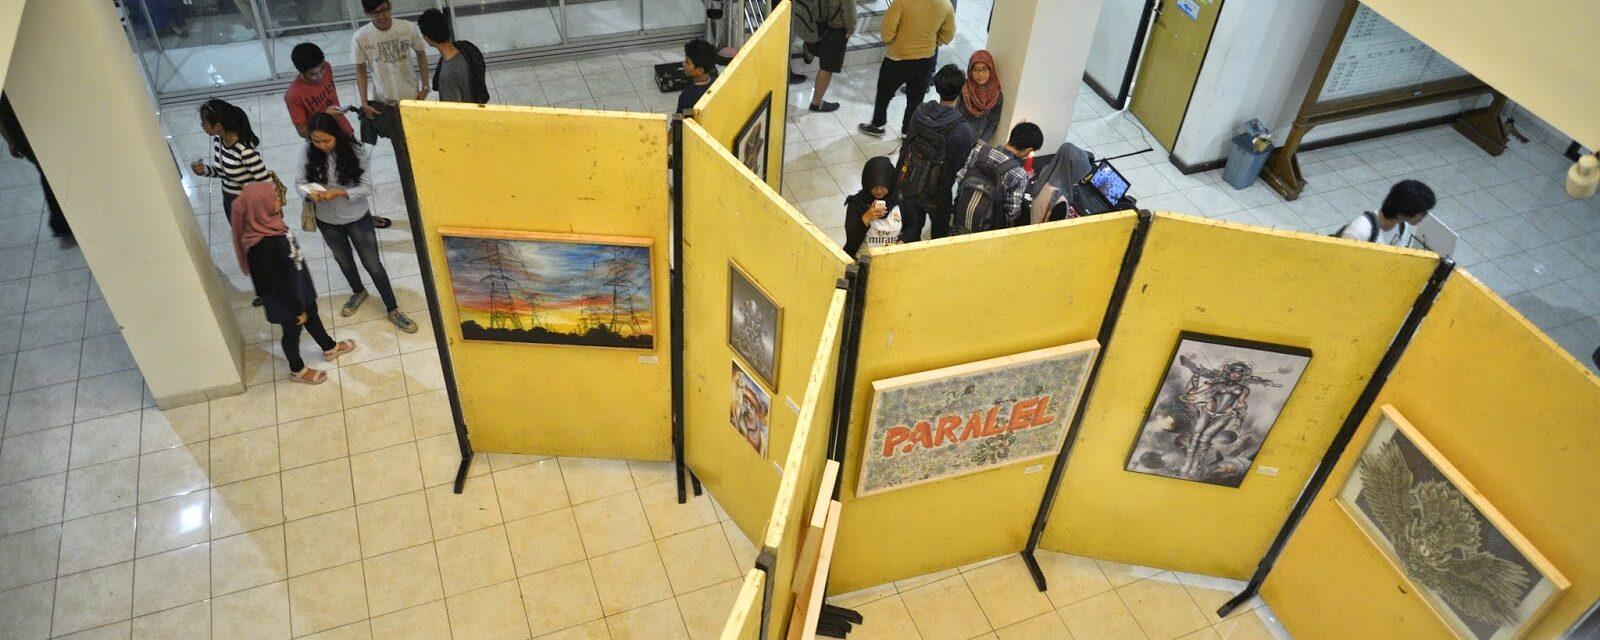 "PAMERAN BERSAMA ""PARALEL"" UKM SERUFO UNY, 04-06 NOVEMBER 2014 DI STUDENT CENTER"